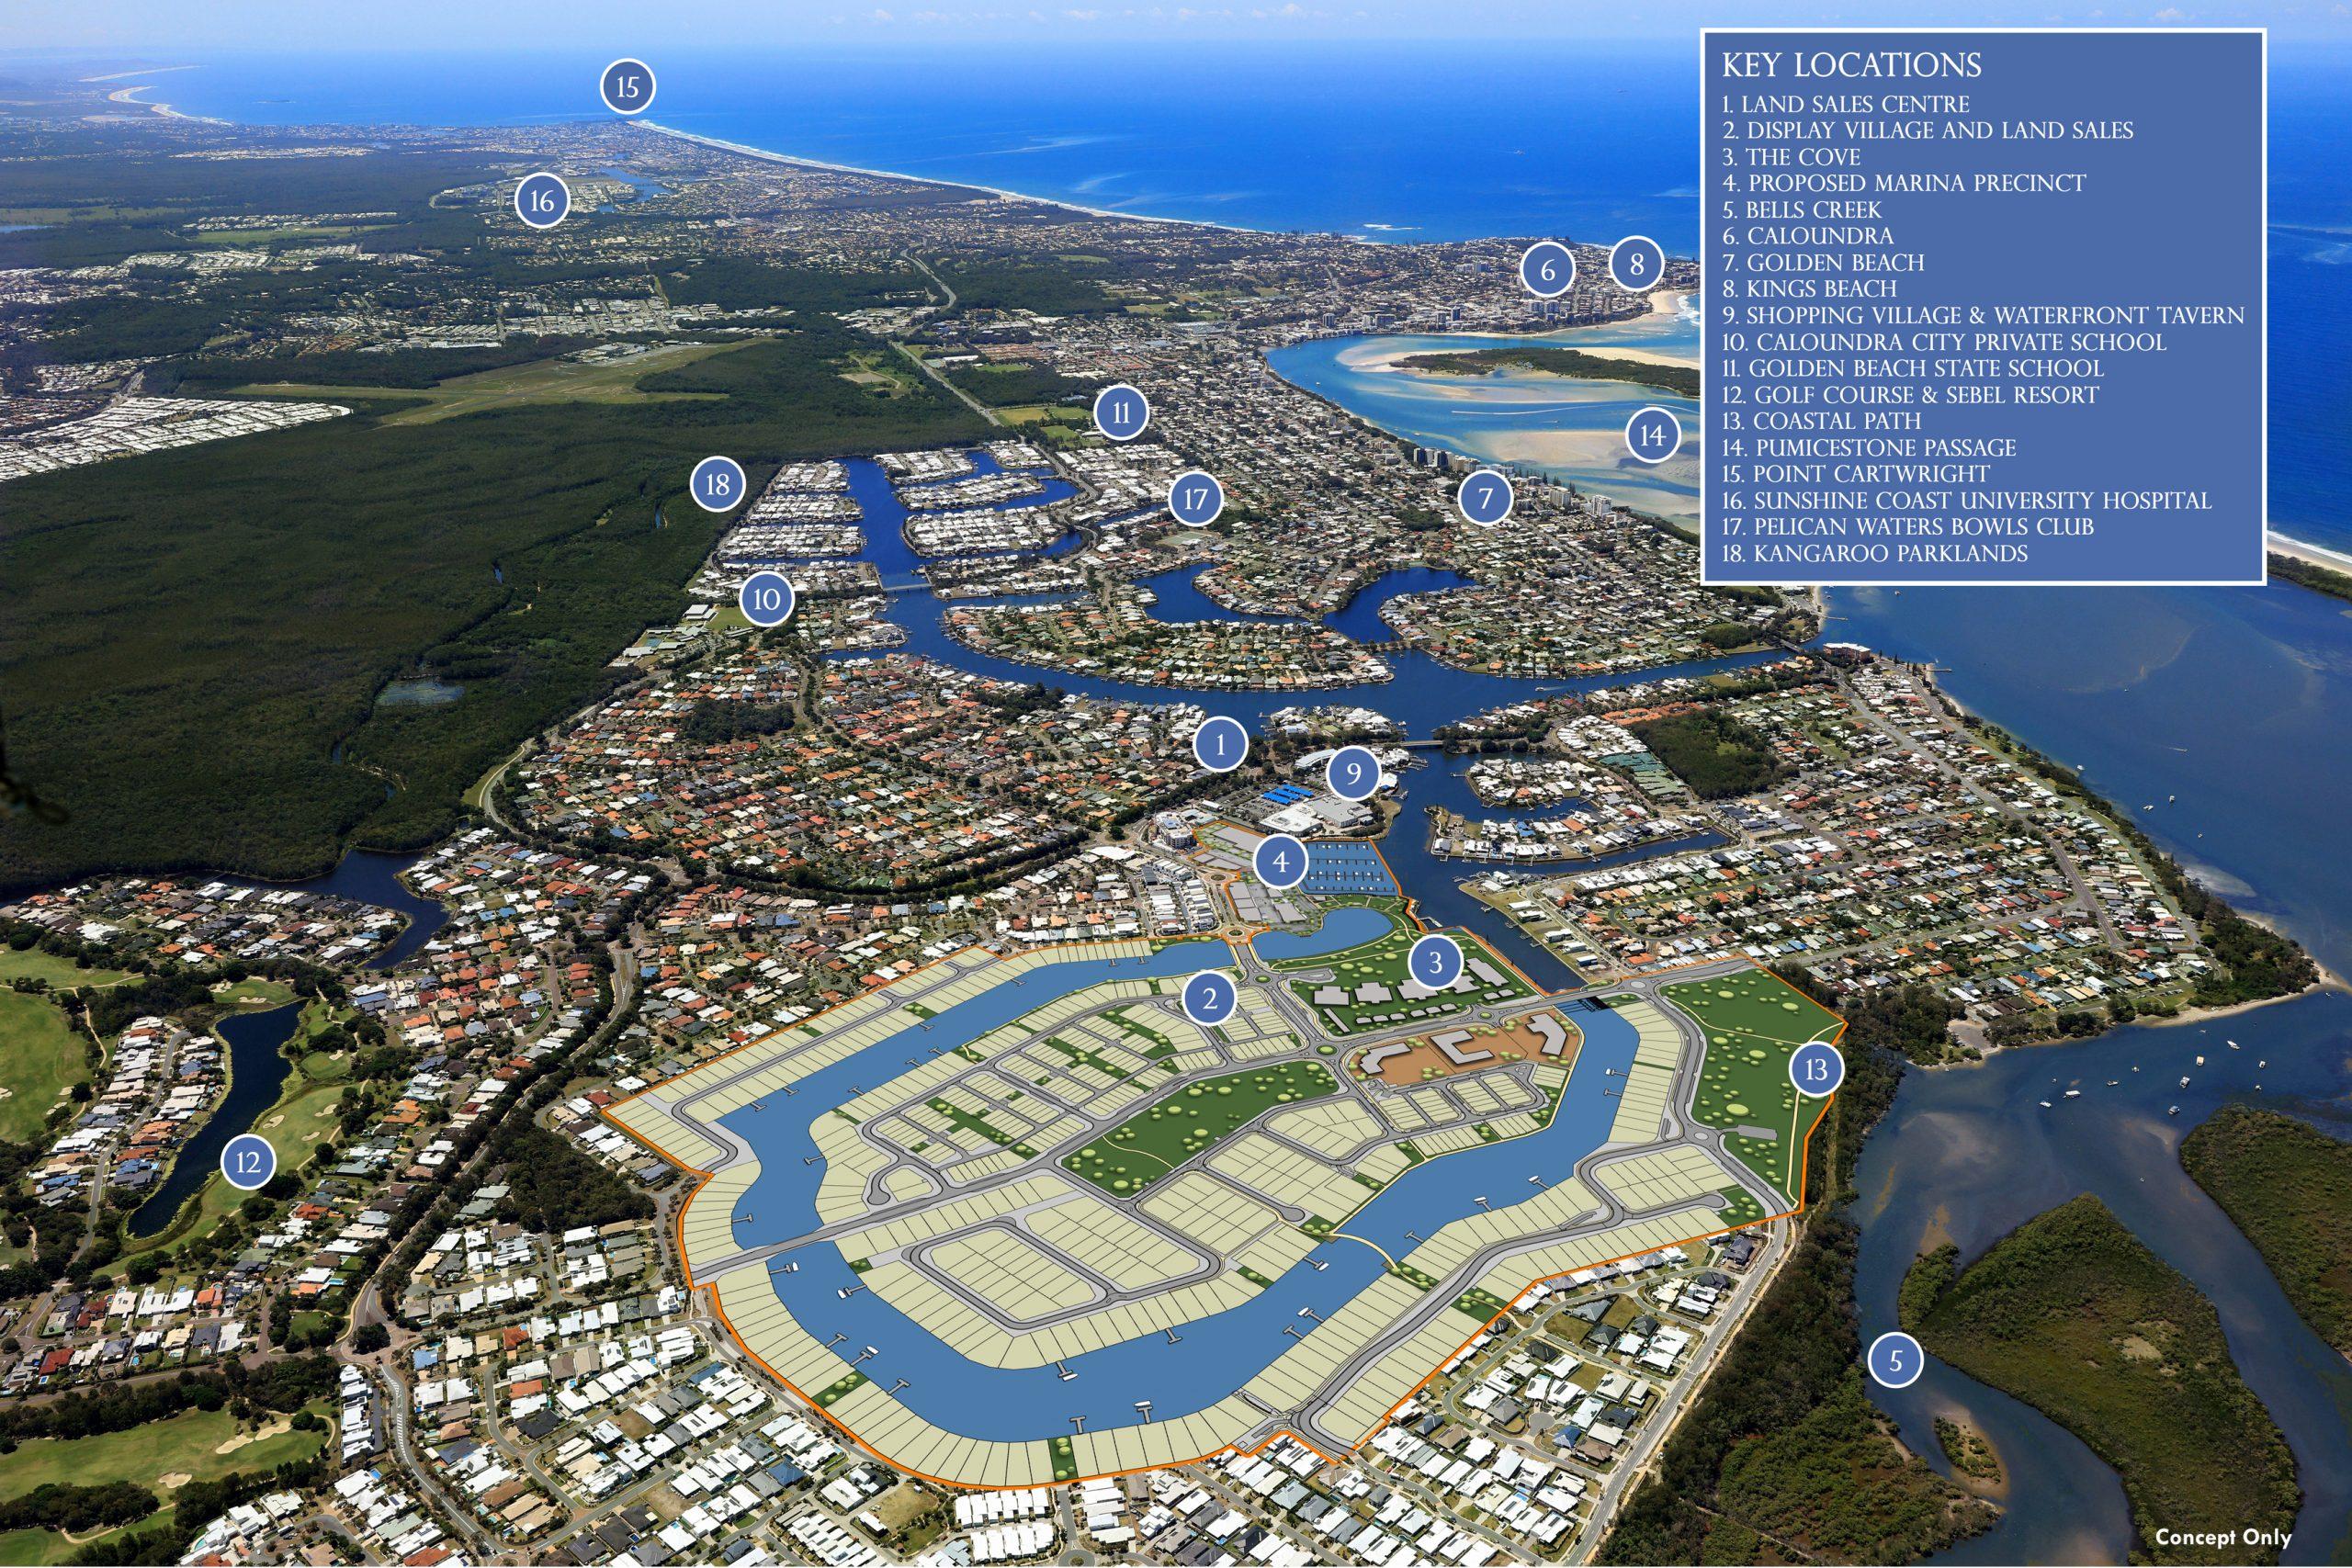 Pelican Waters Master Plan